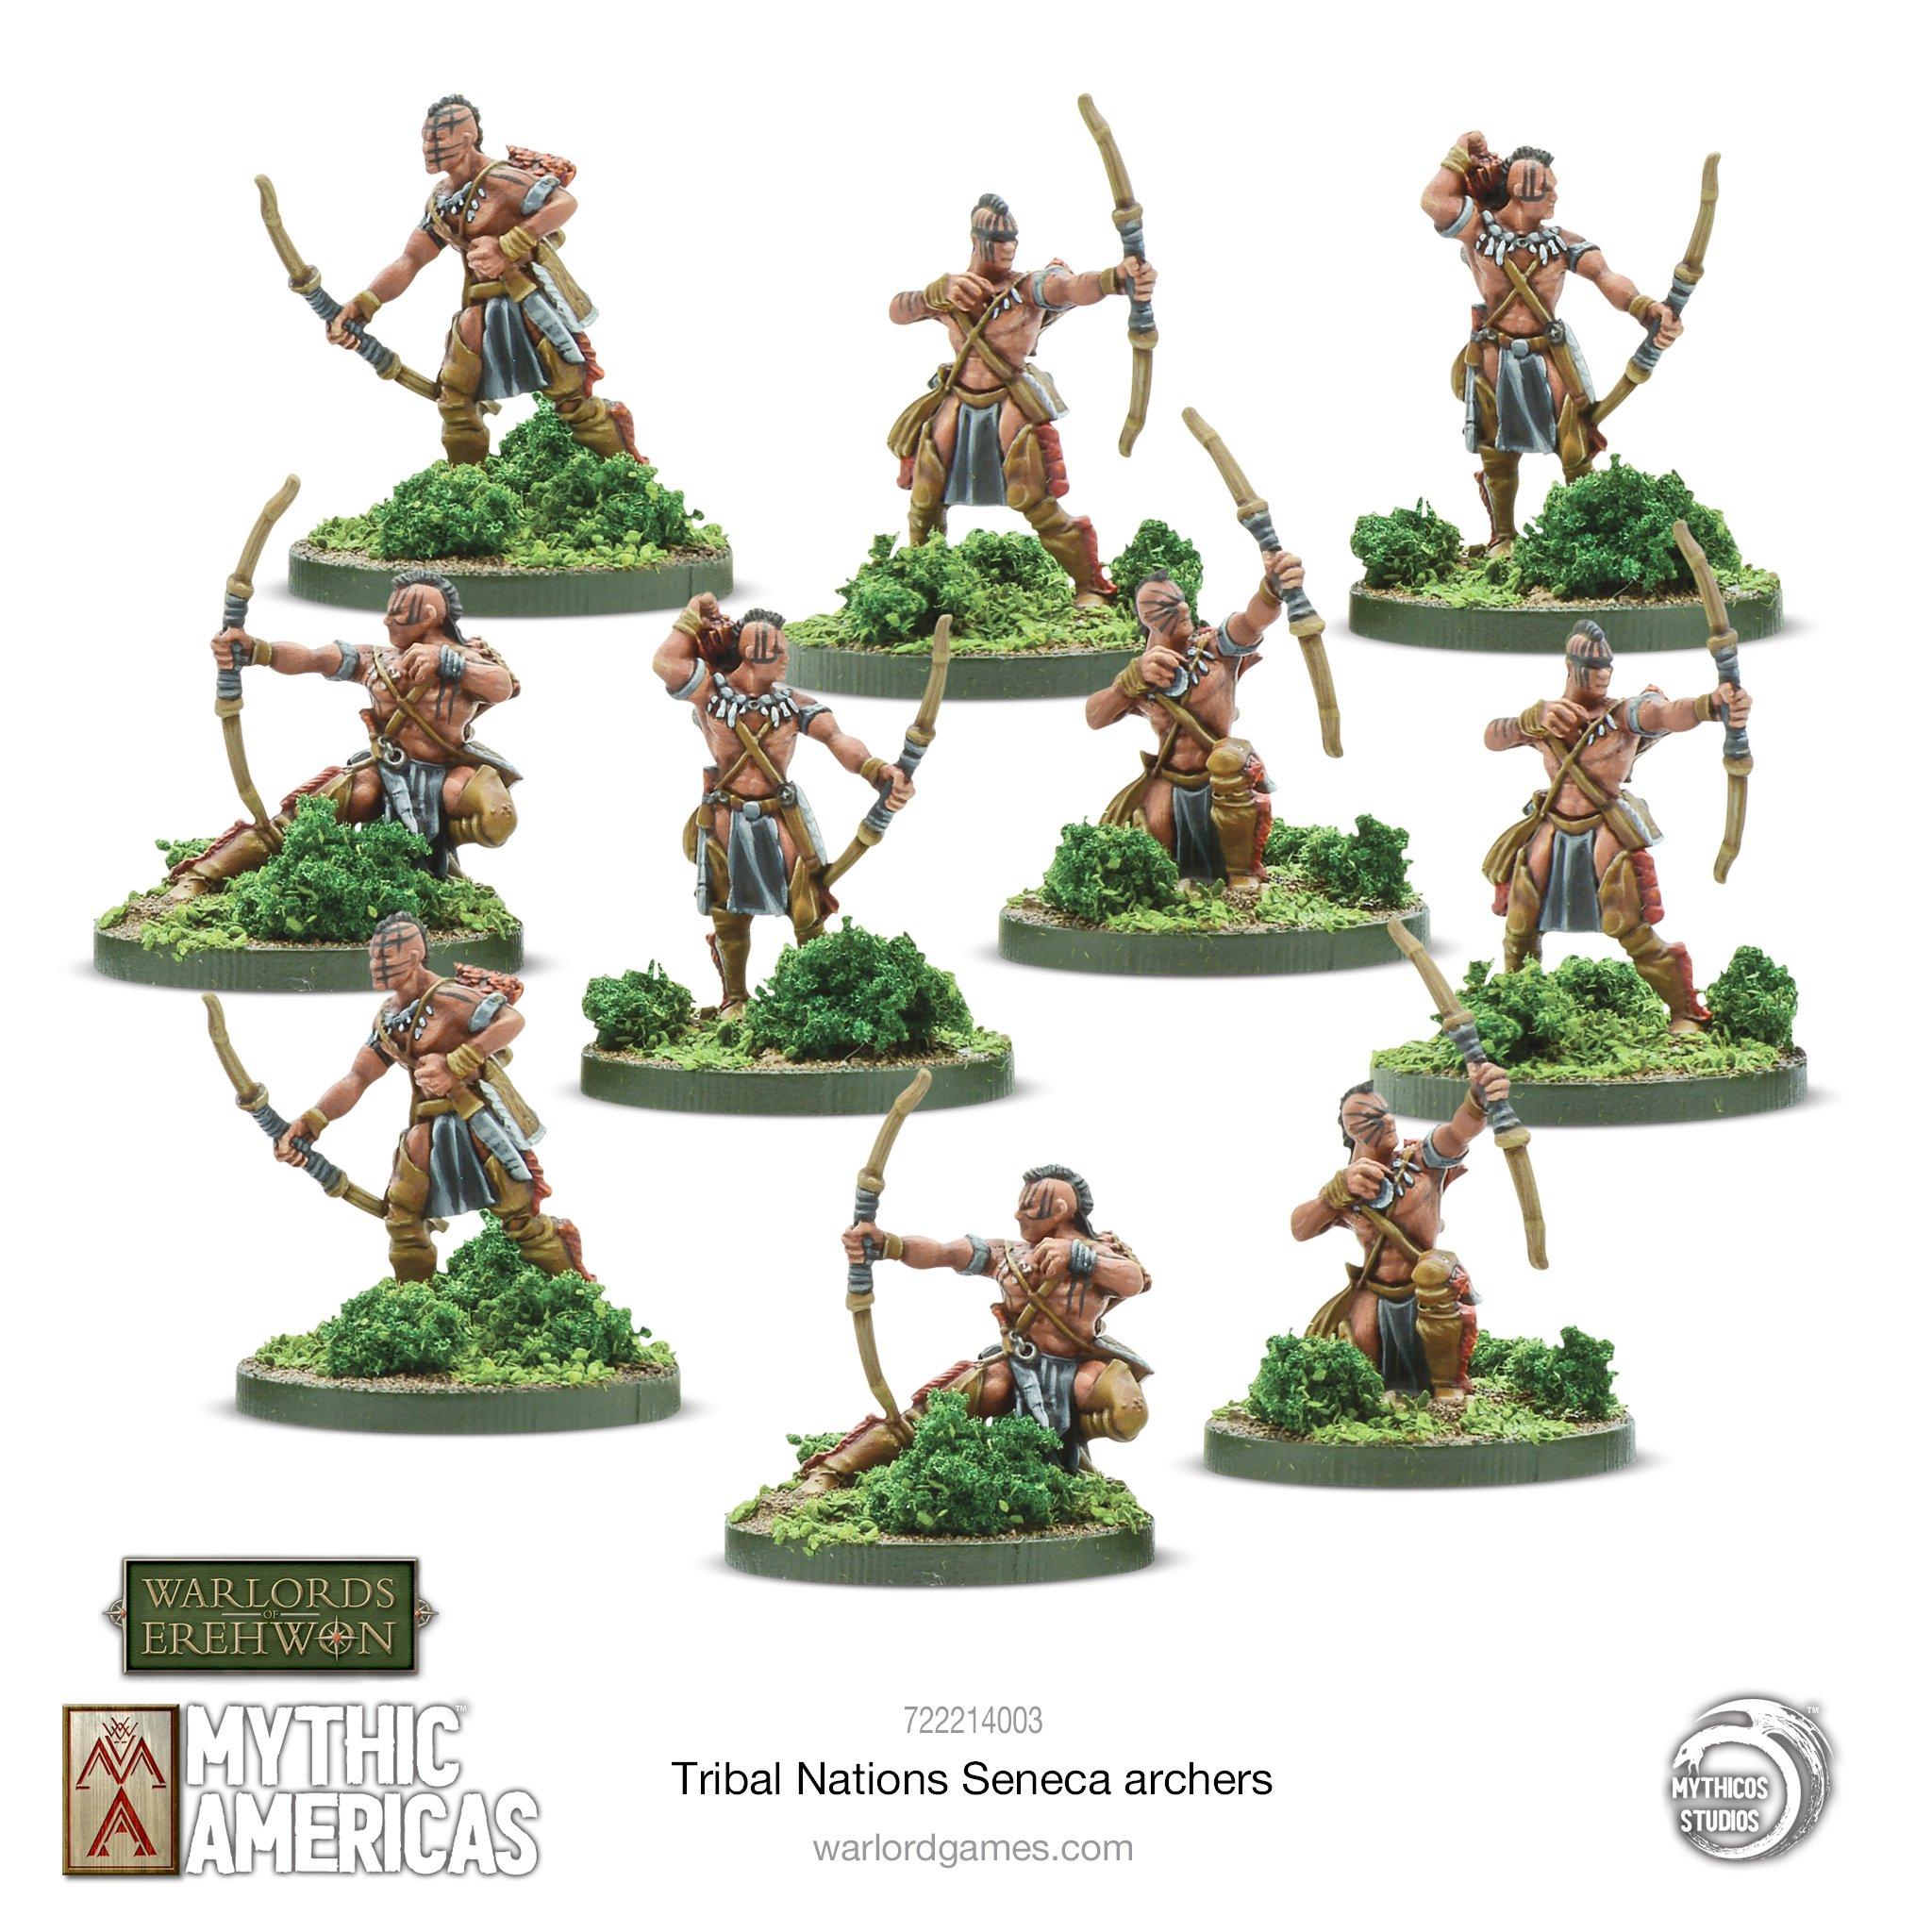 Mythic Americas Tribal Nations Seneca Archers